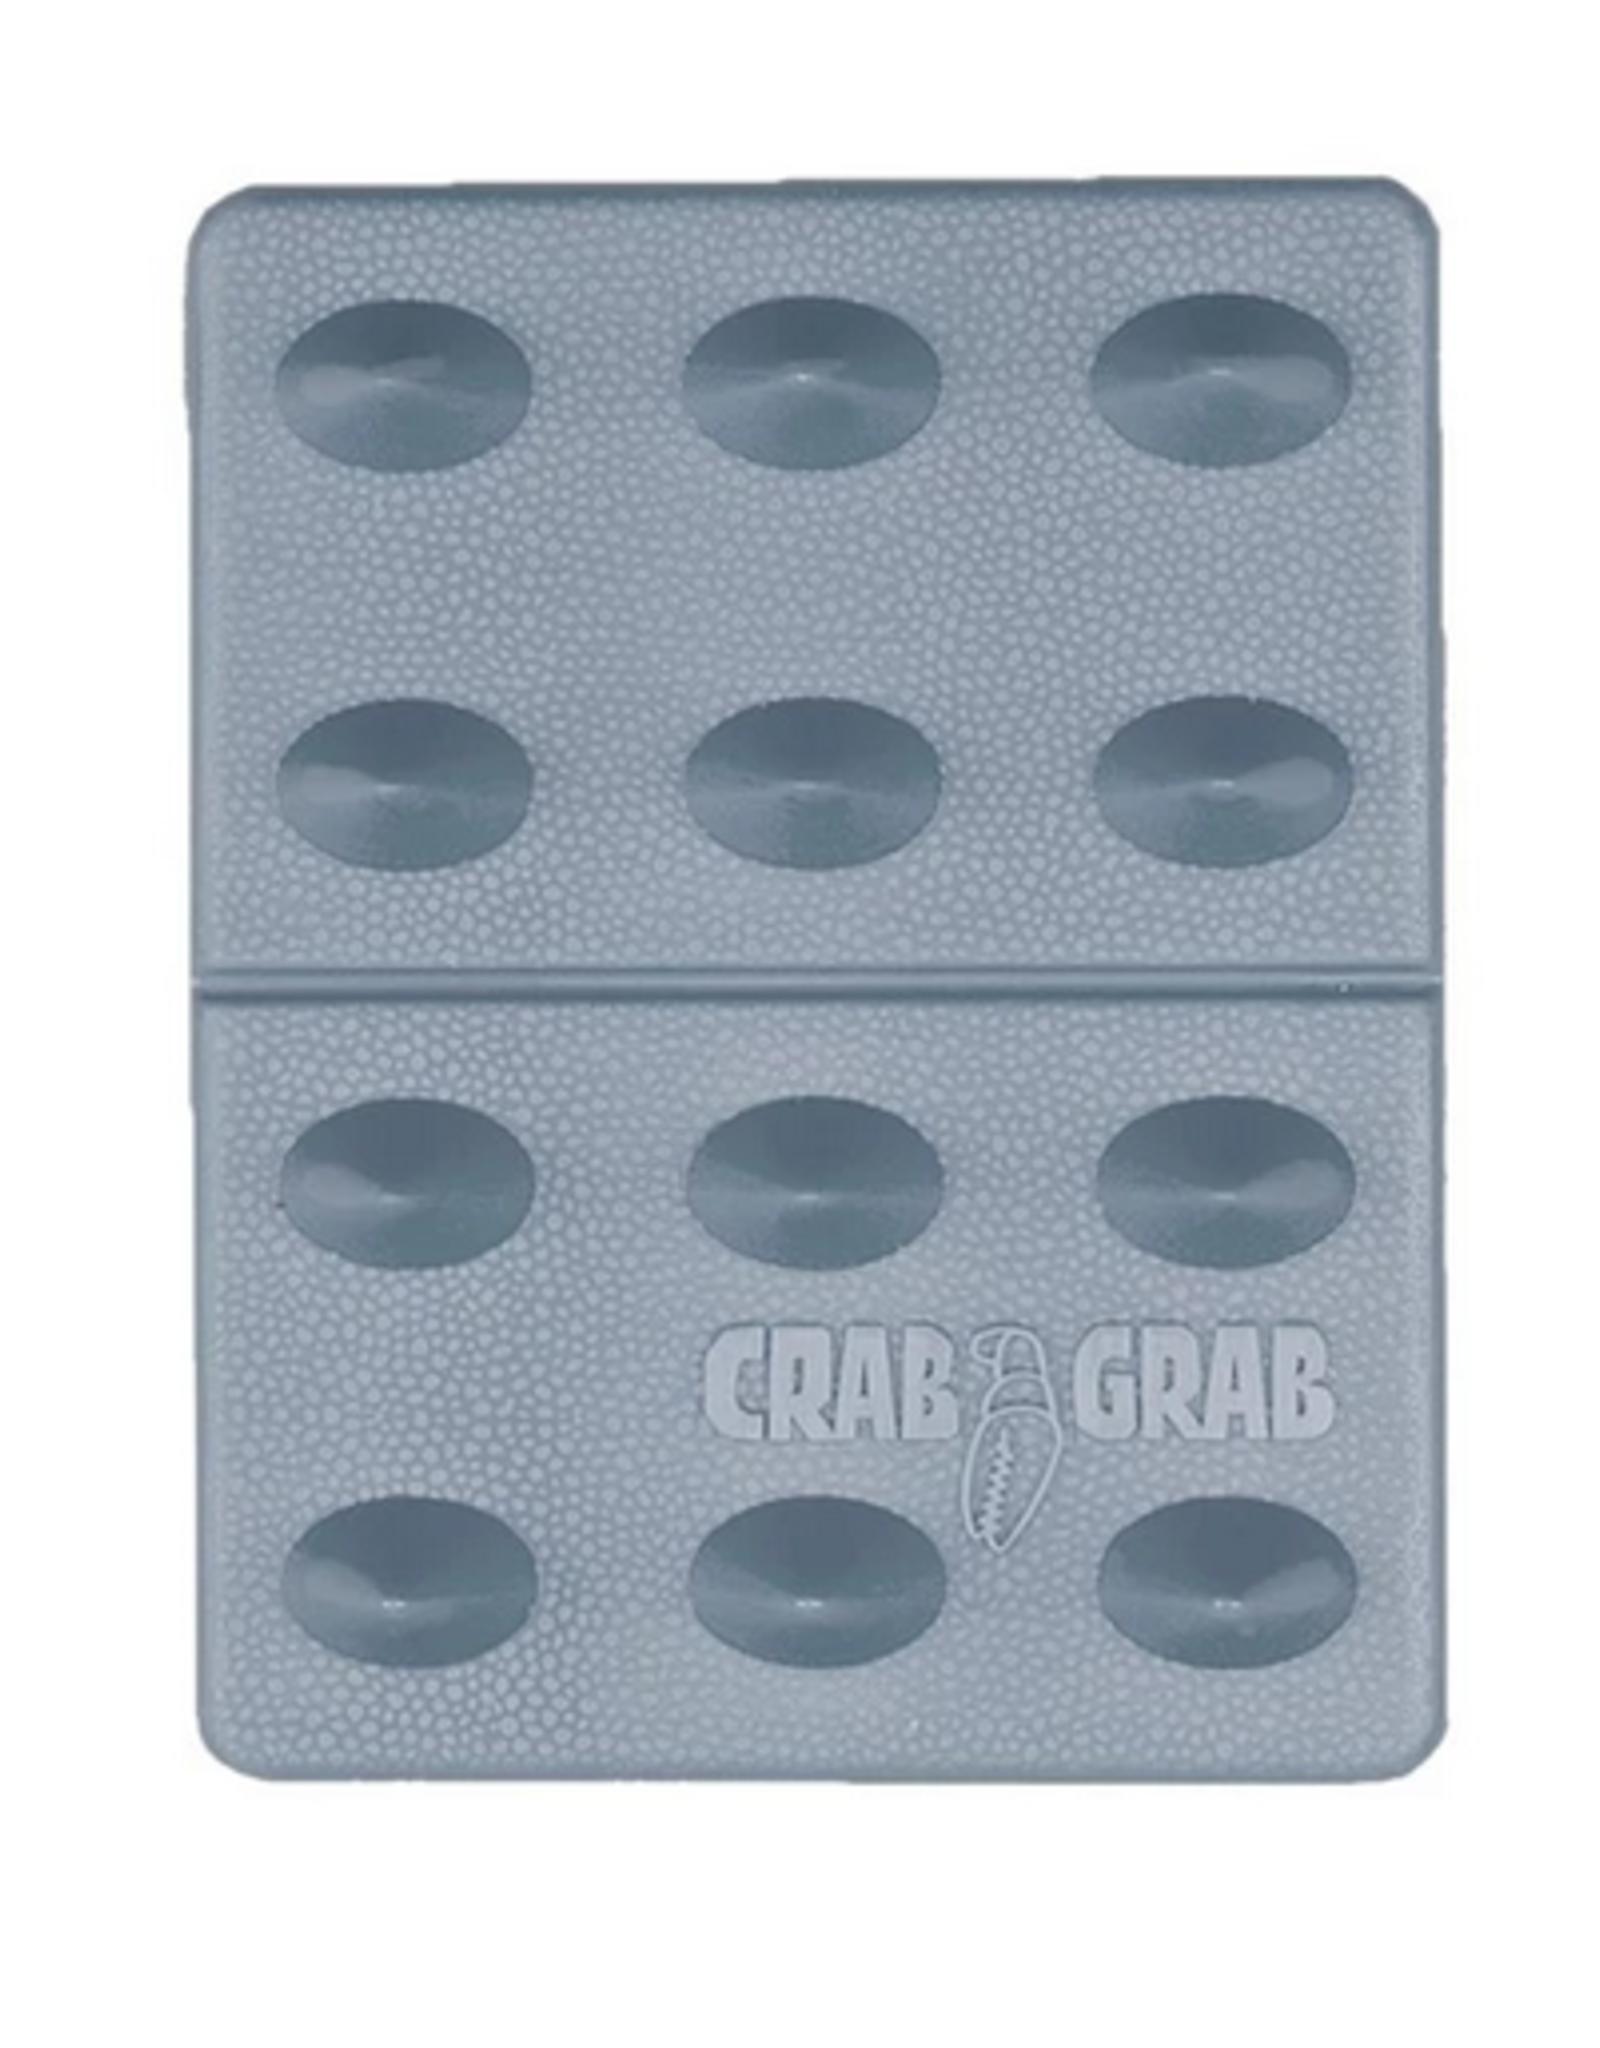 CRAB GRAB CRAB GRAB MINI SHARK TEETH TRACTION STOMP PAD CLEAR